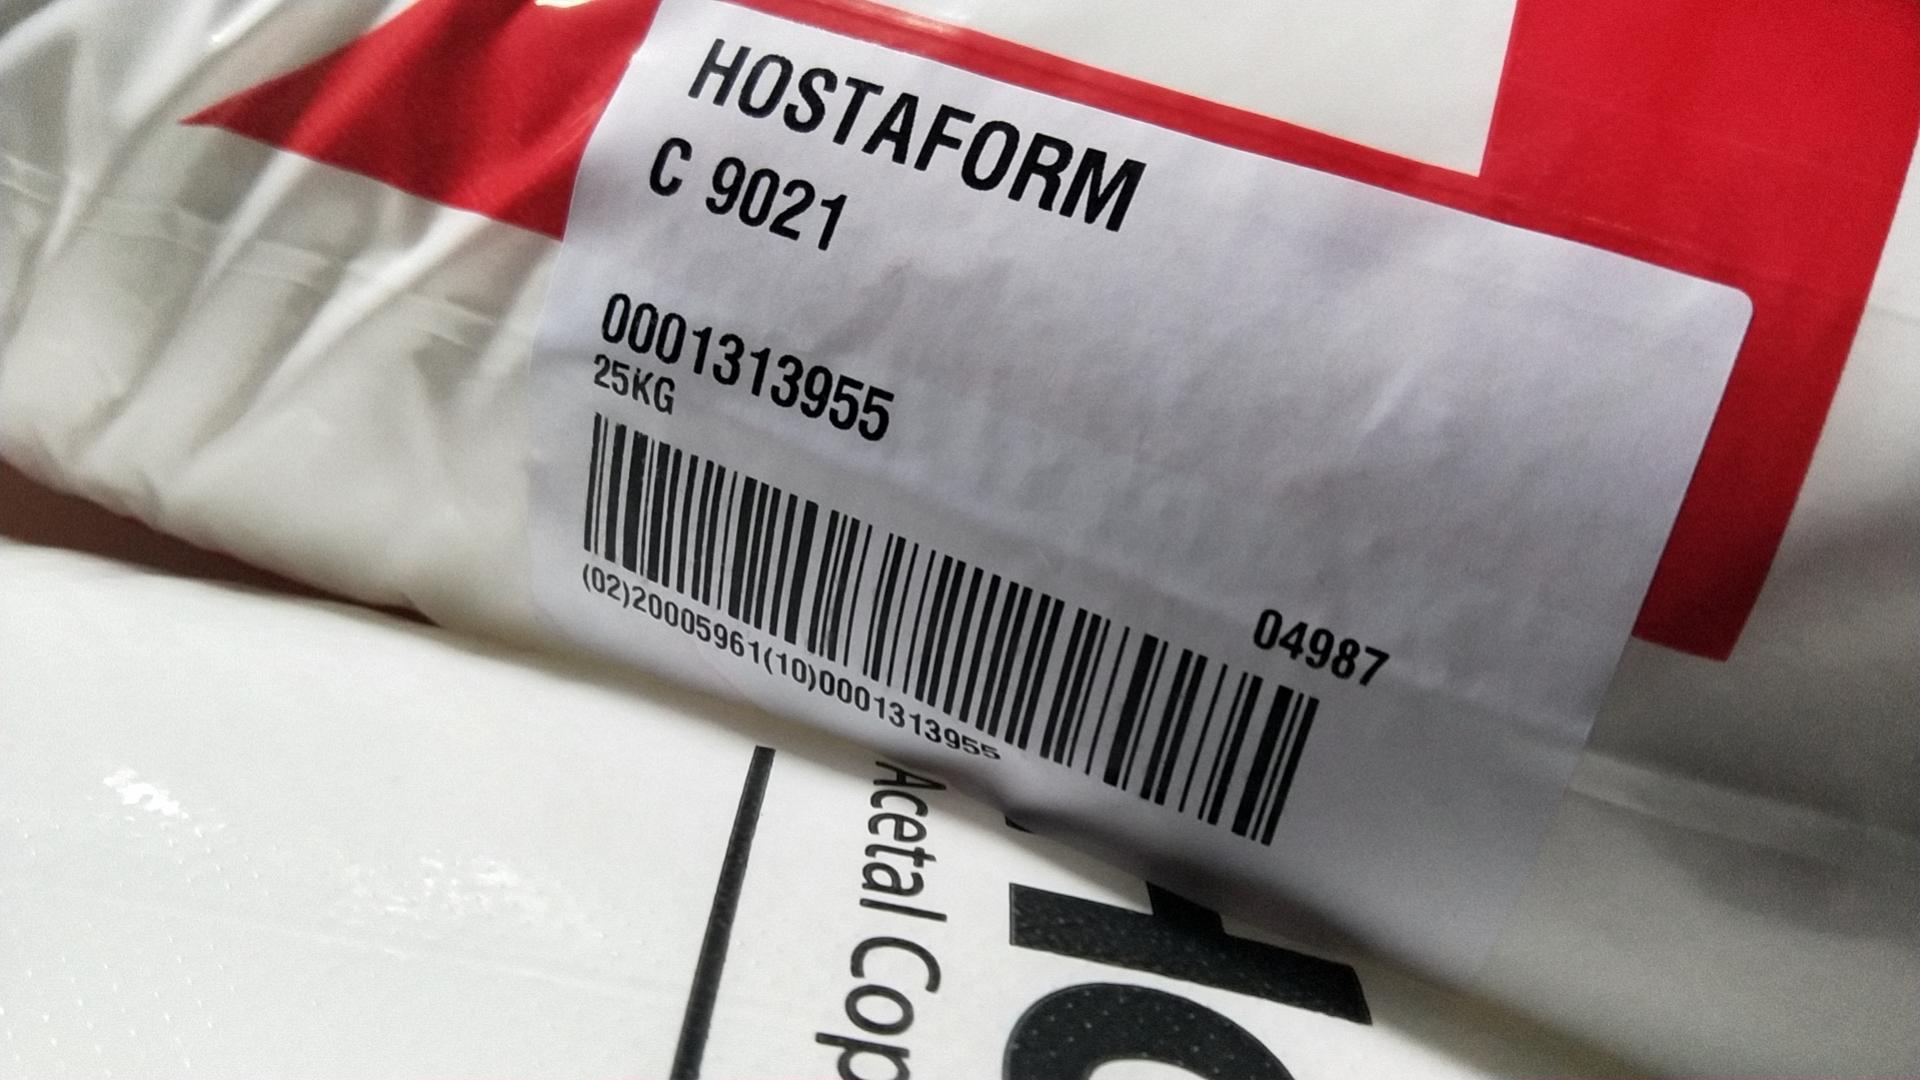 HOSTAFORM C9021